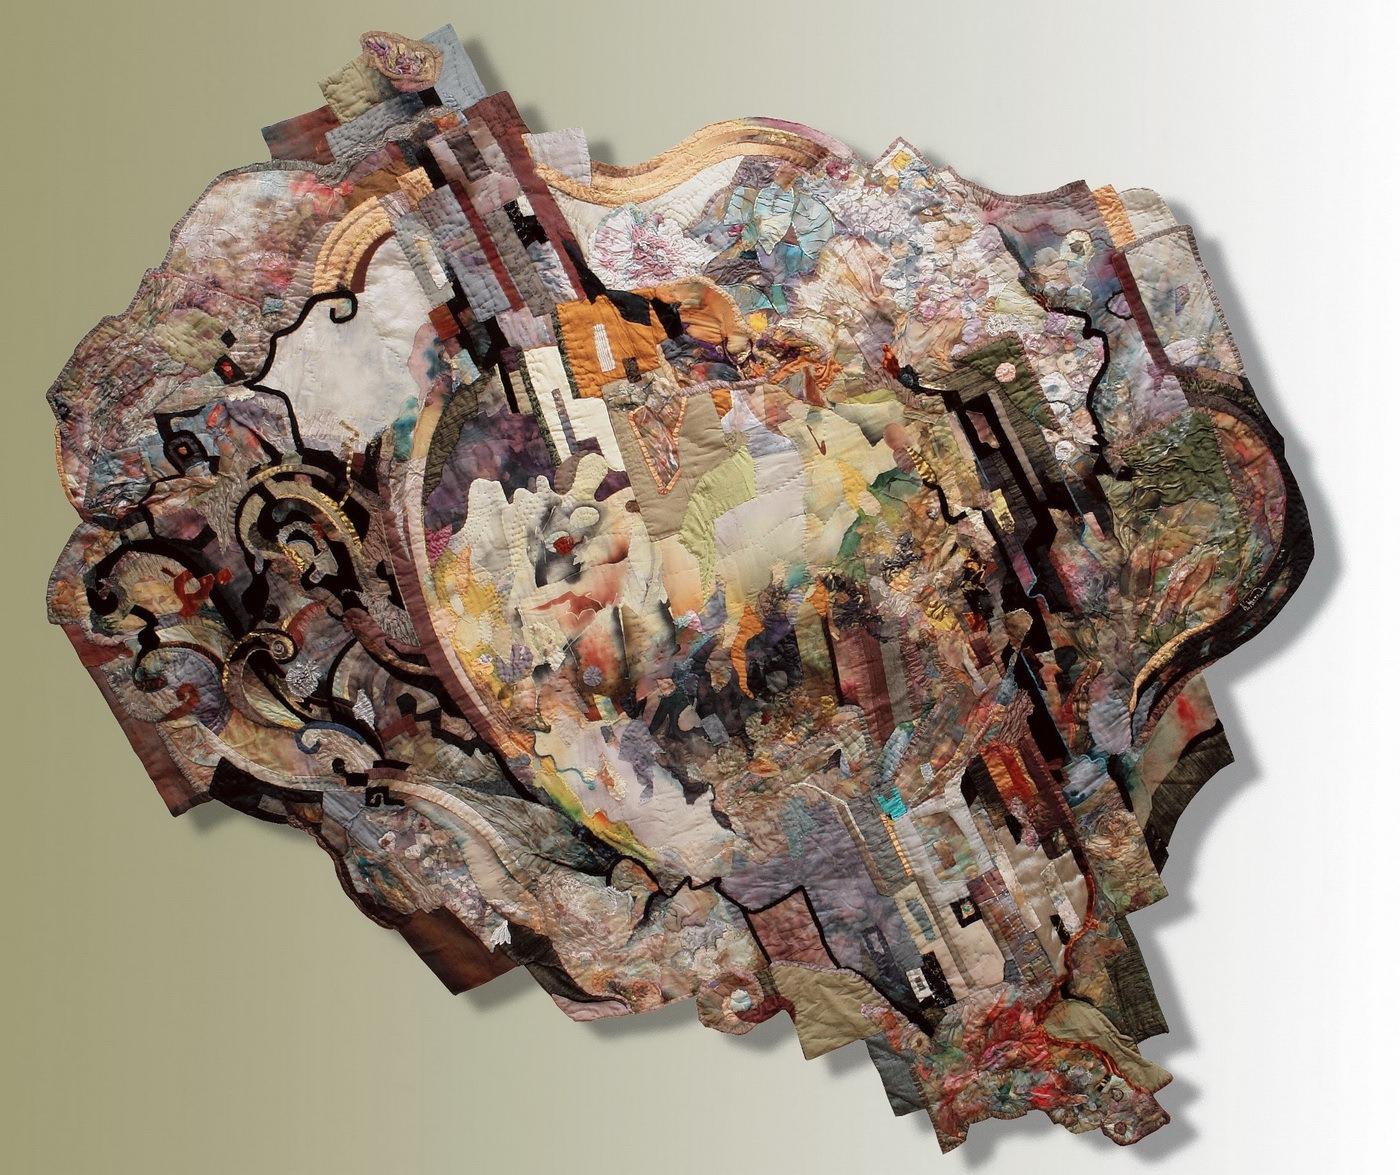 Н. Мурадова. Текстильное панно Роман будет прочитан. 250х270 см. 2004 год. Авторская техника